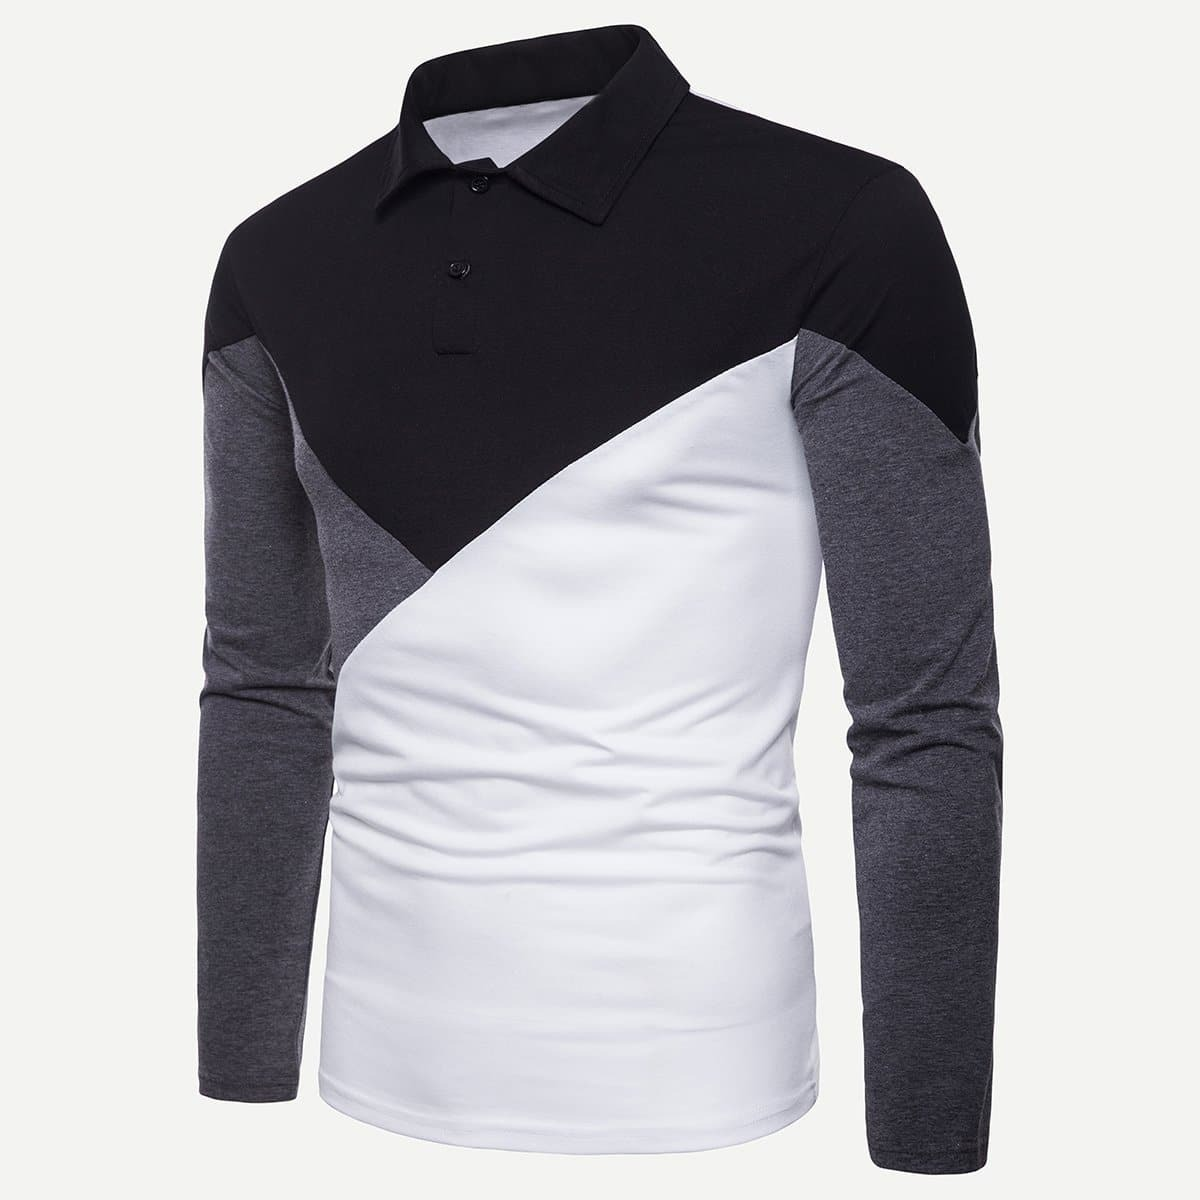 Polo shirt met verschillende kleuren